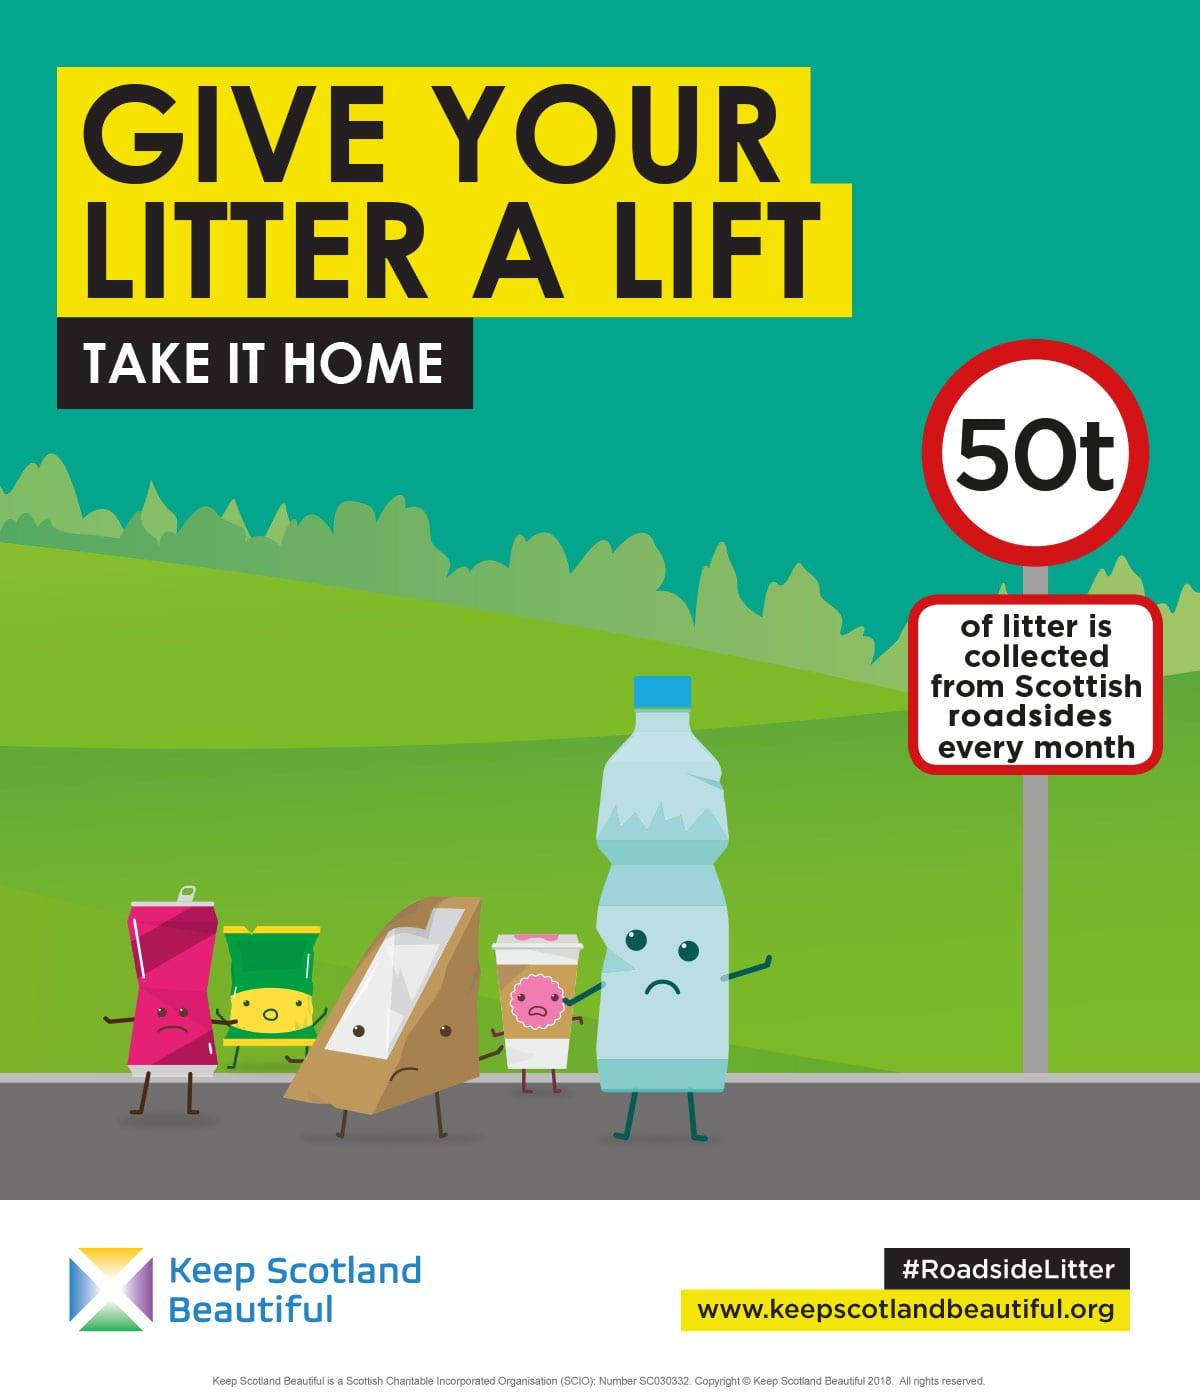 Keep Scotland Beautiful – Give your litter a lift